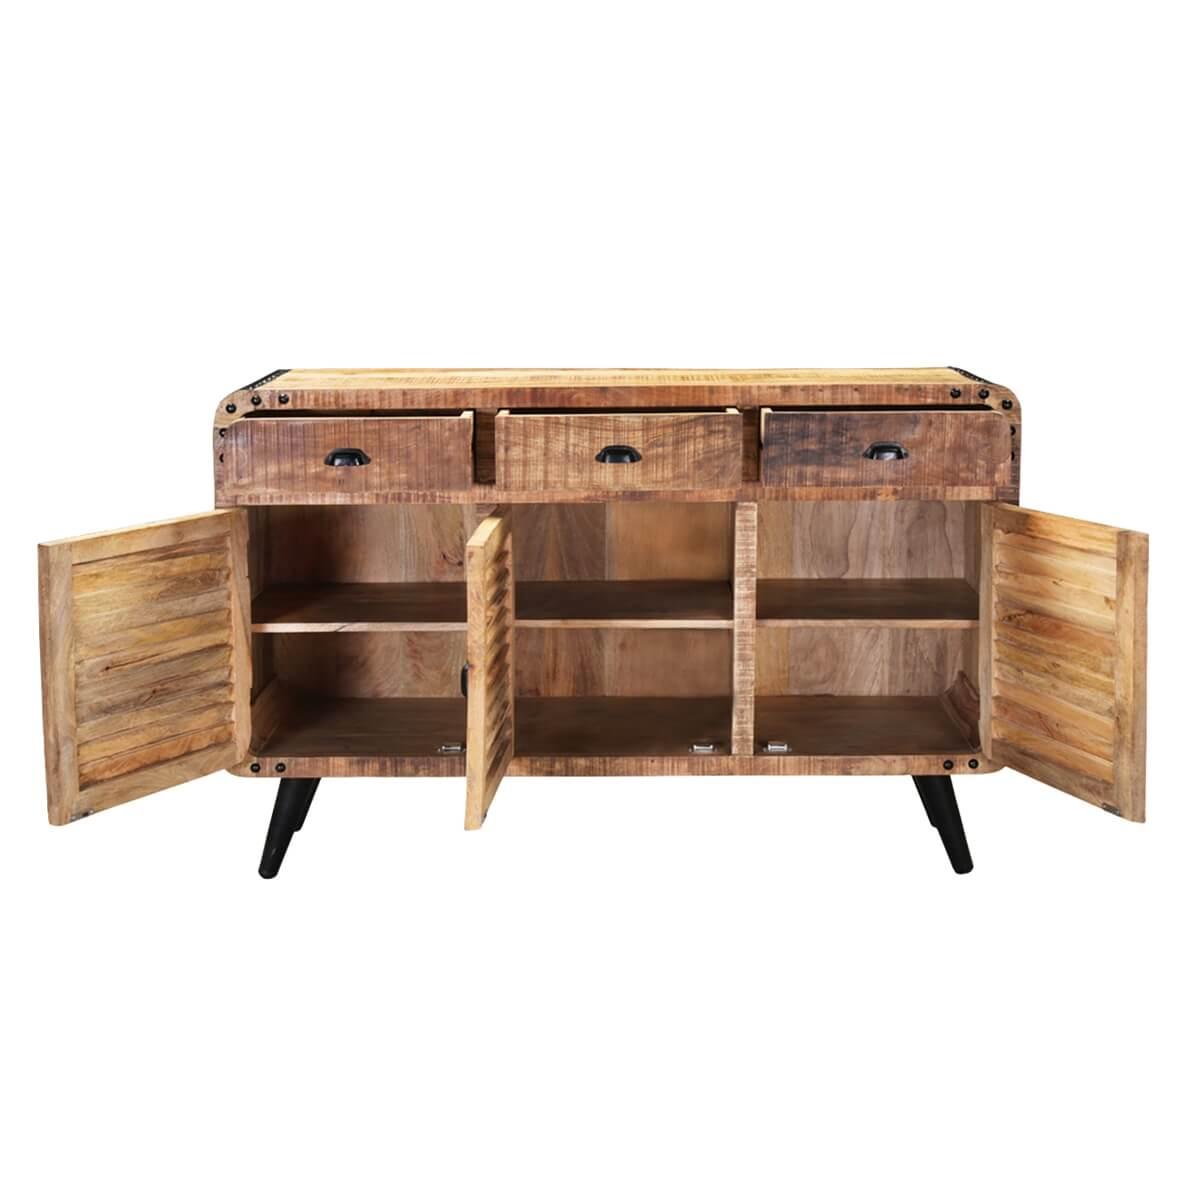 alger retro style rustic mango wood 3 drawer industrial sideboard. Black Bedroom Furniture Sets. Home Design Ideas